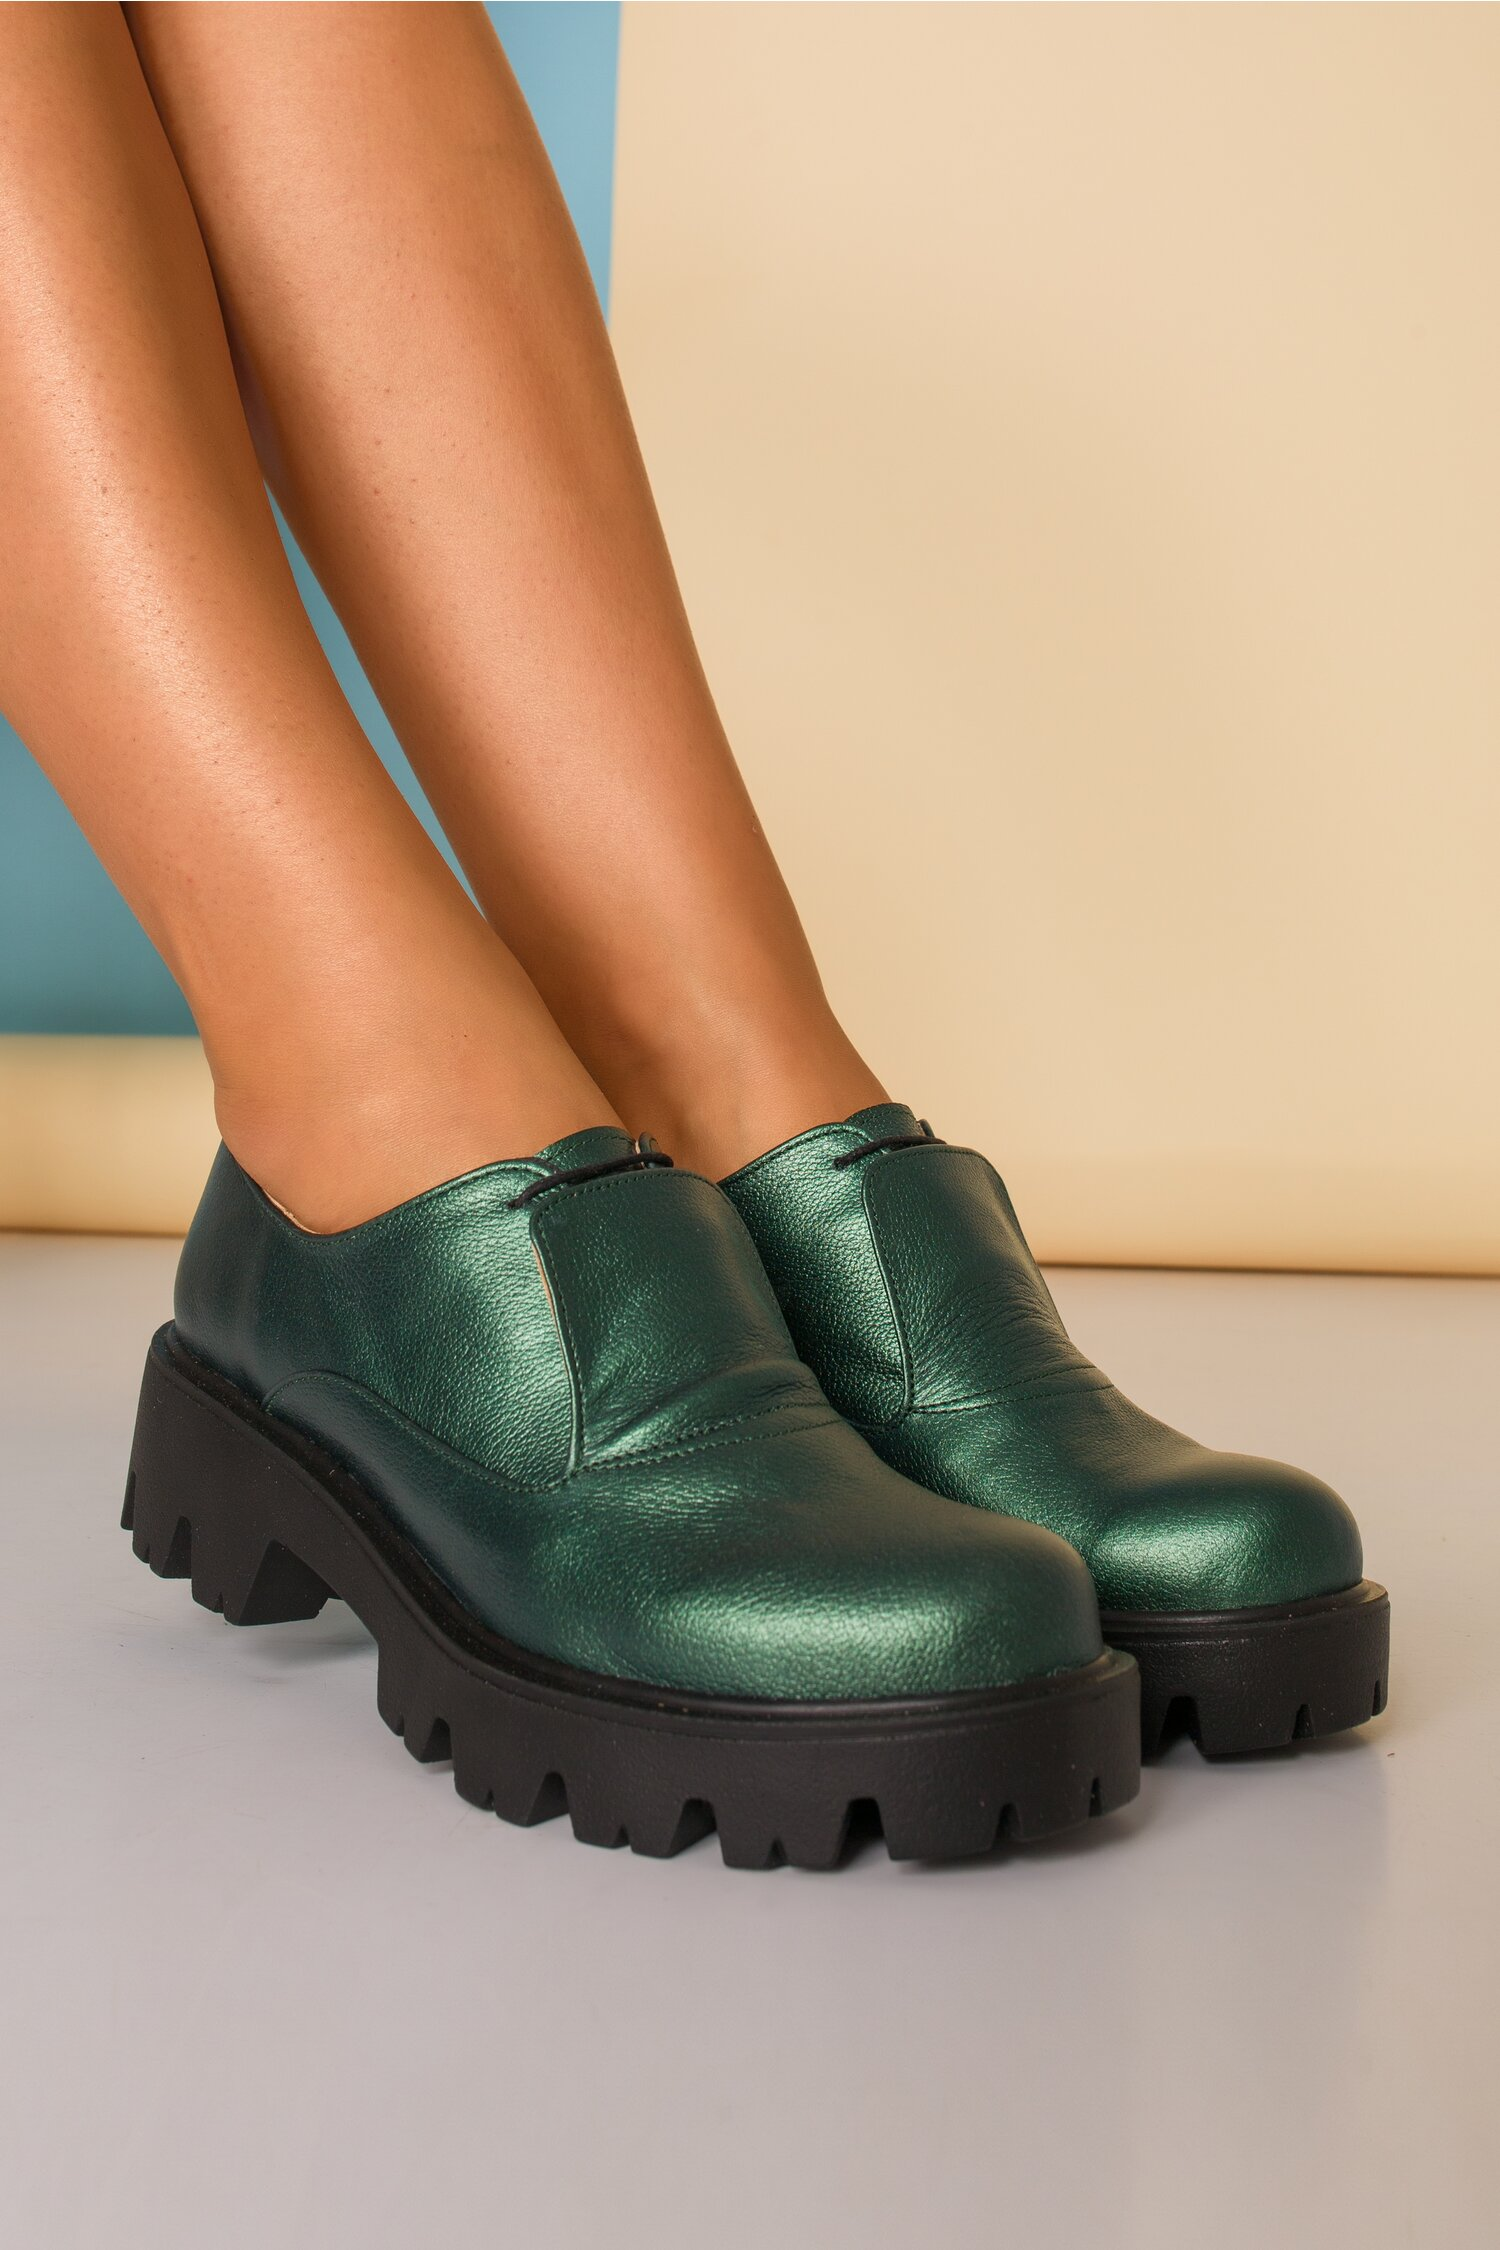 Pantofi verzi cu talpa joasa si limba dubla cu siret